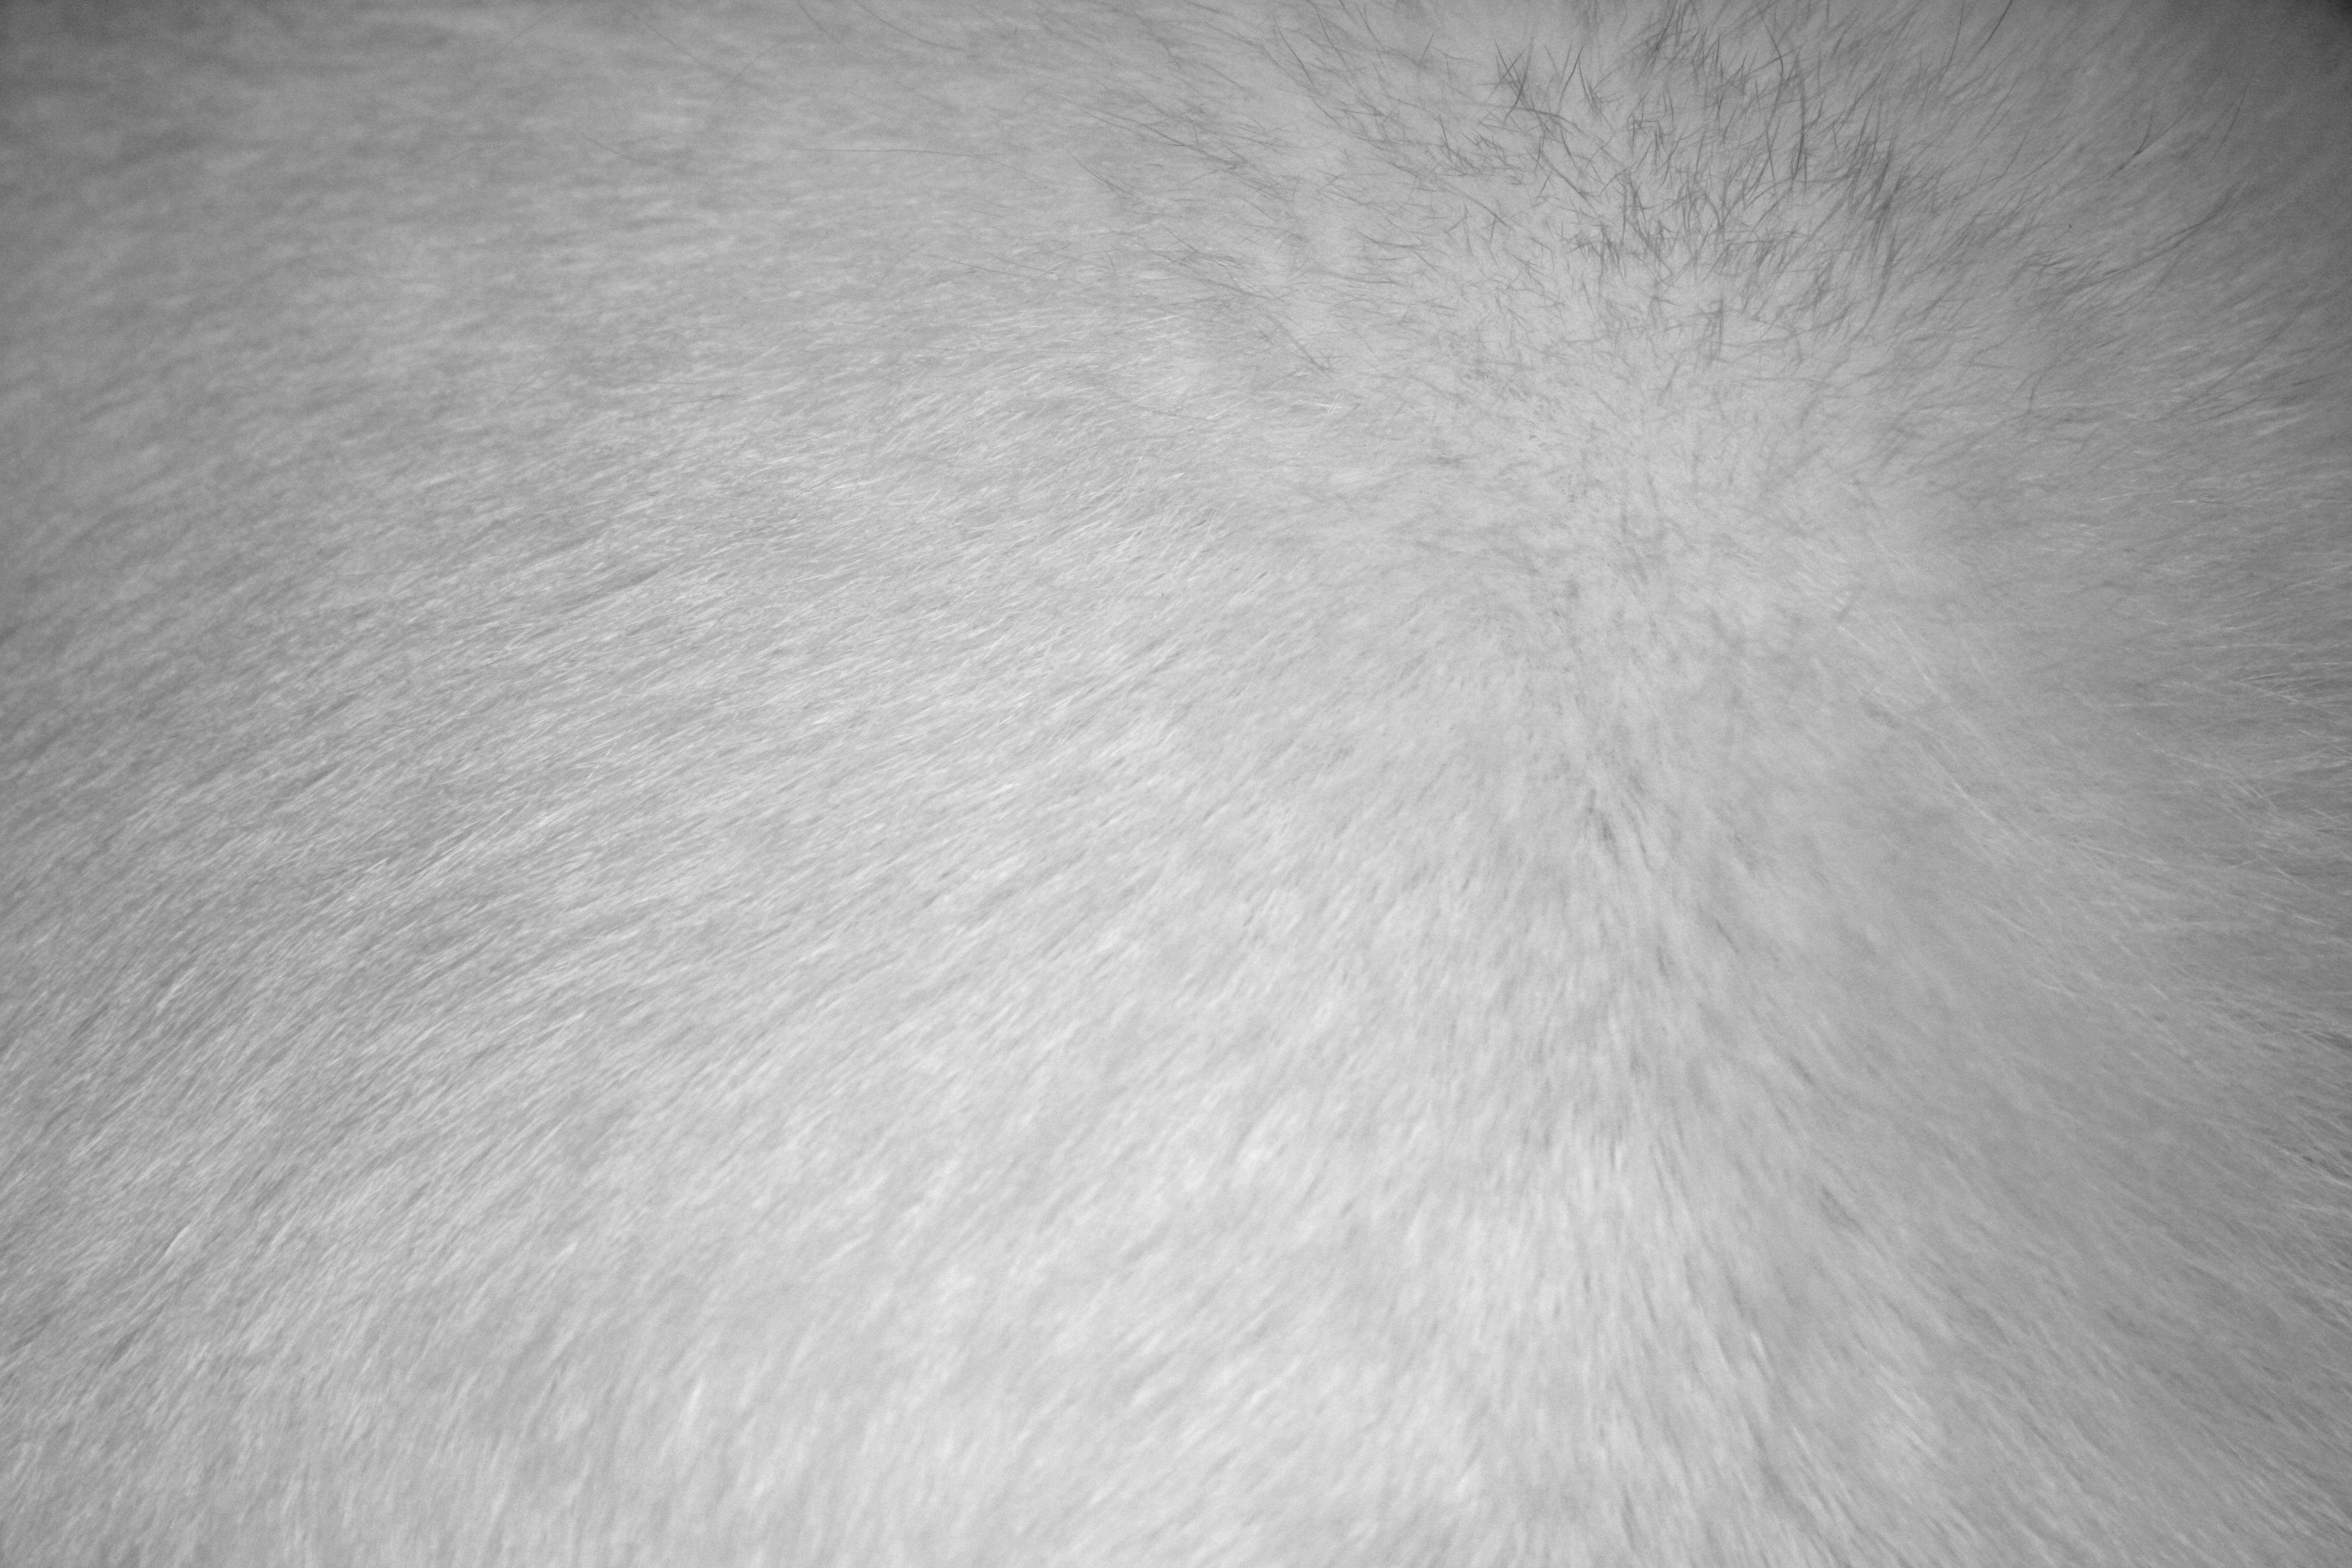 white fur texture picture free photograph photos